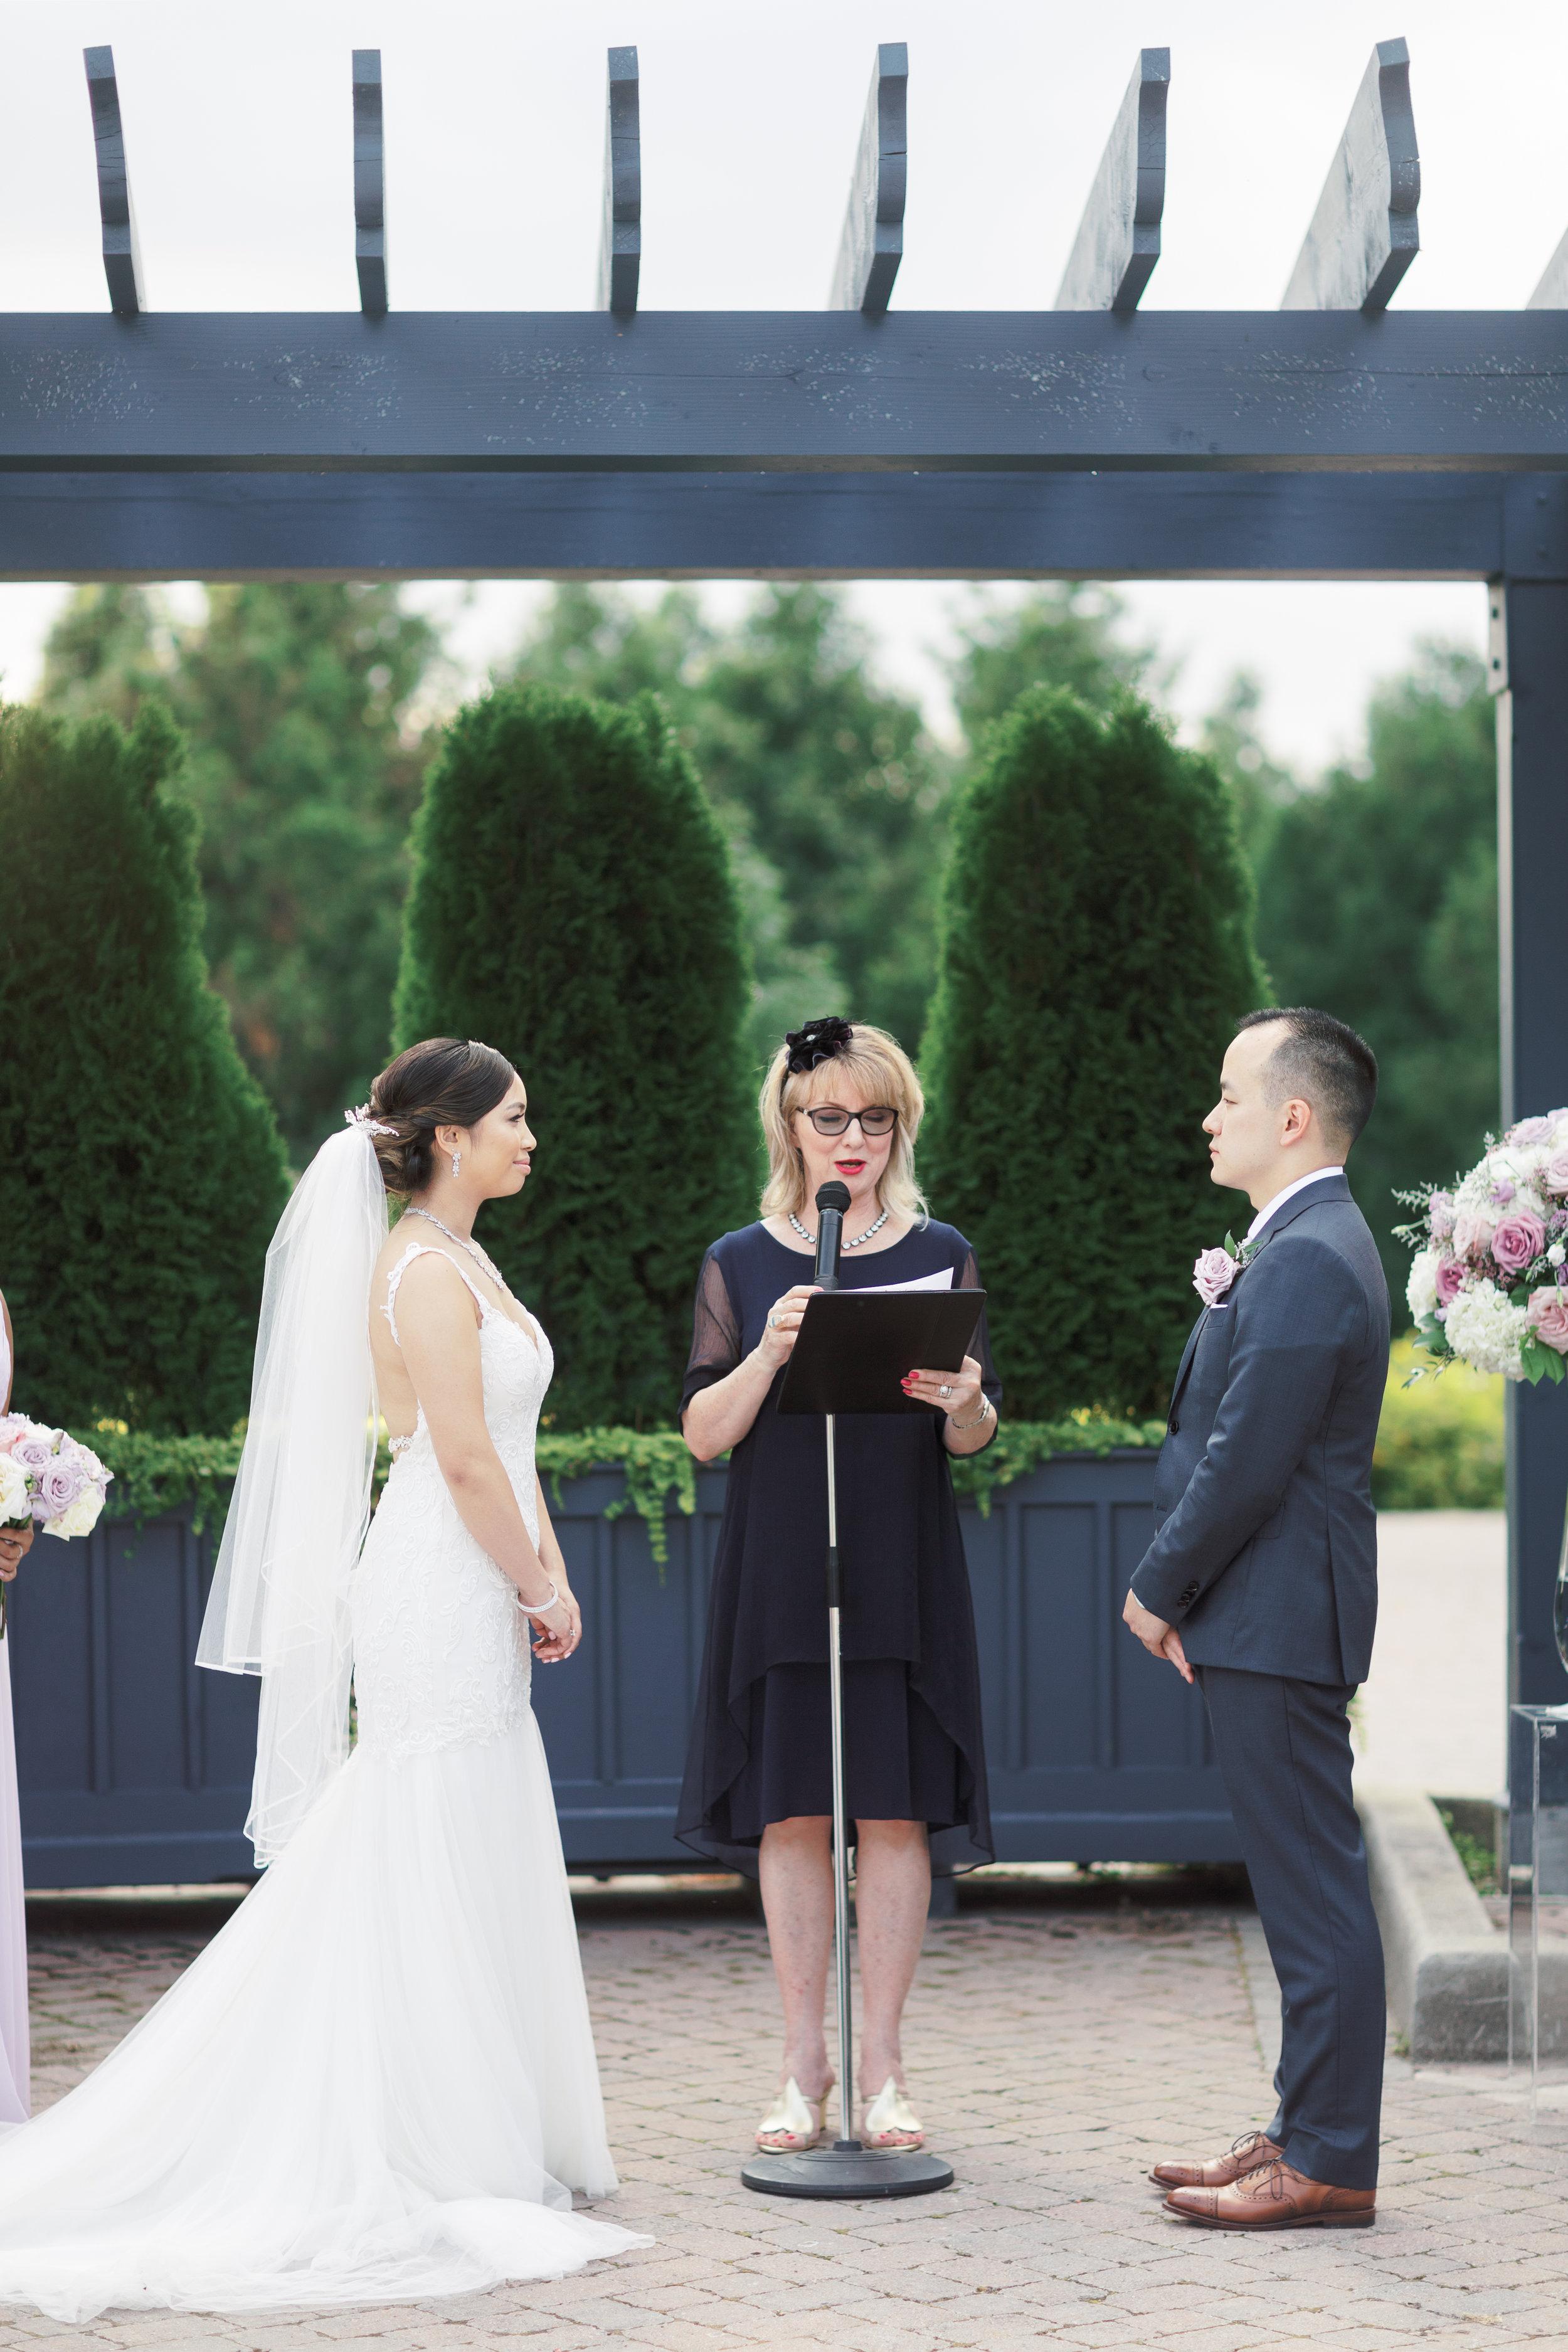 Angus Glen Wedding - Ceremony-50.jpg